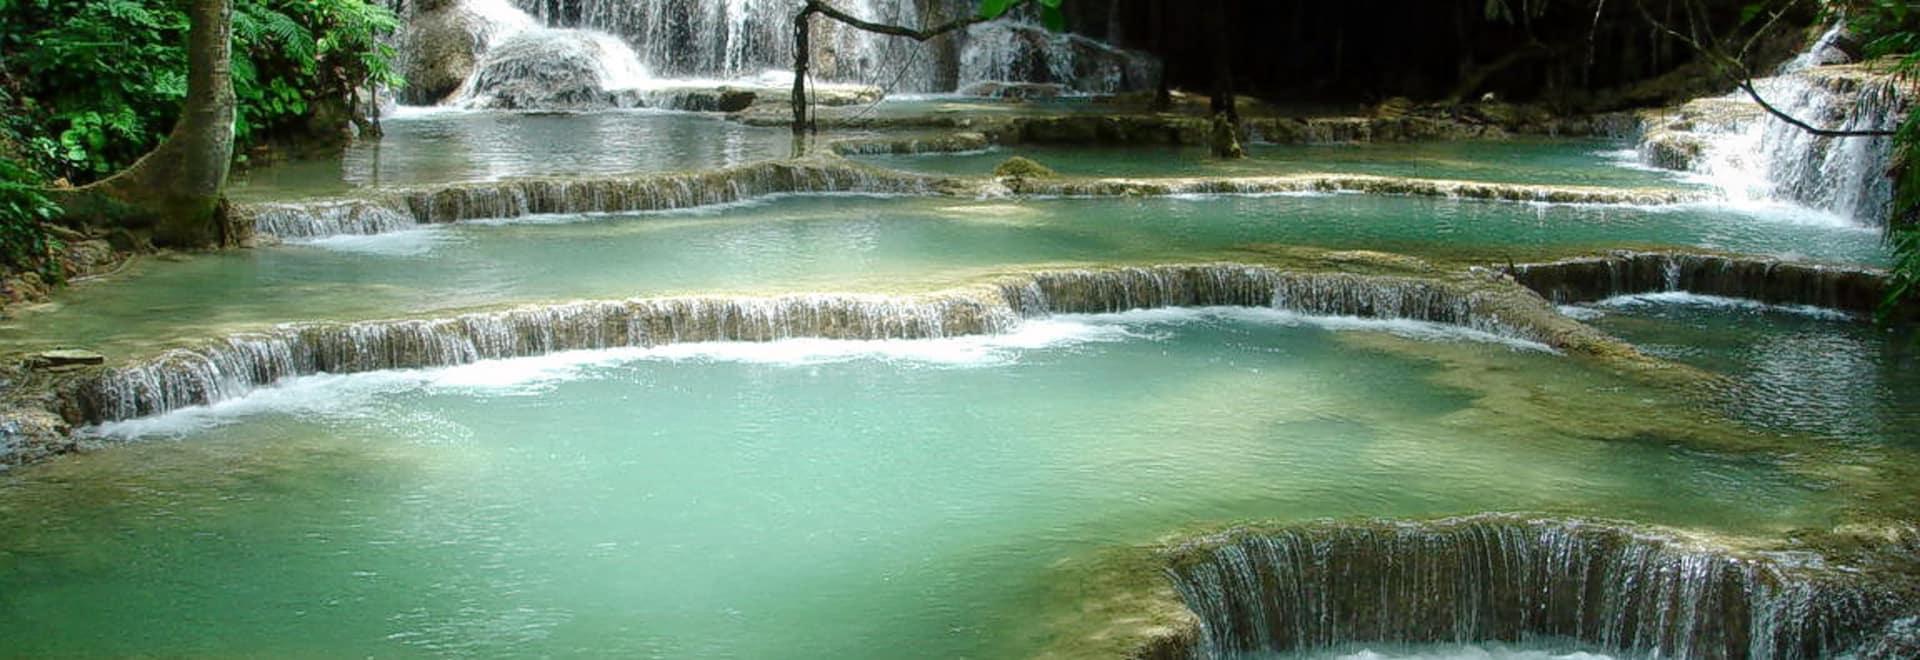 1492006816_luang-prabang-kuang-si-waterfall.jpg